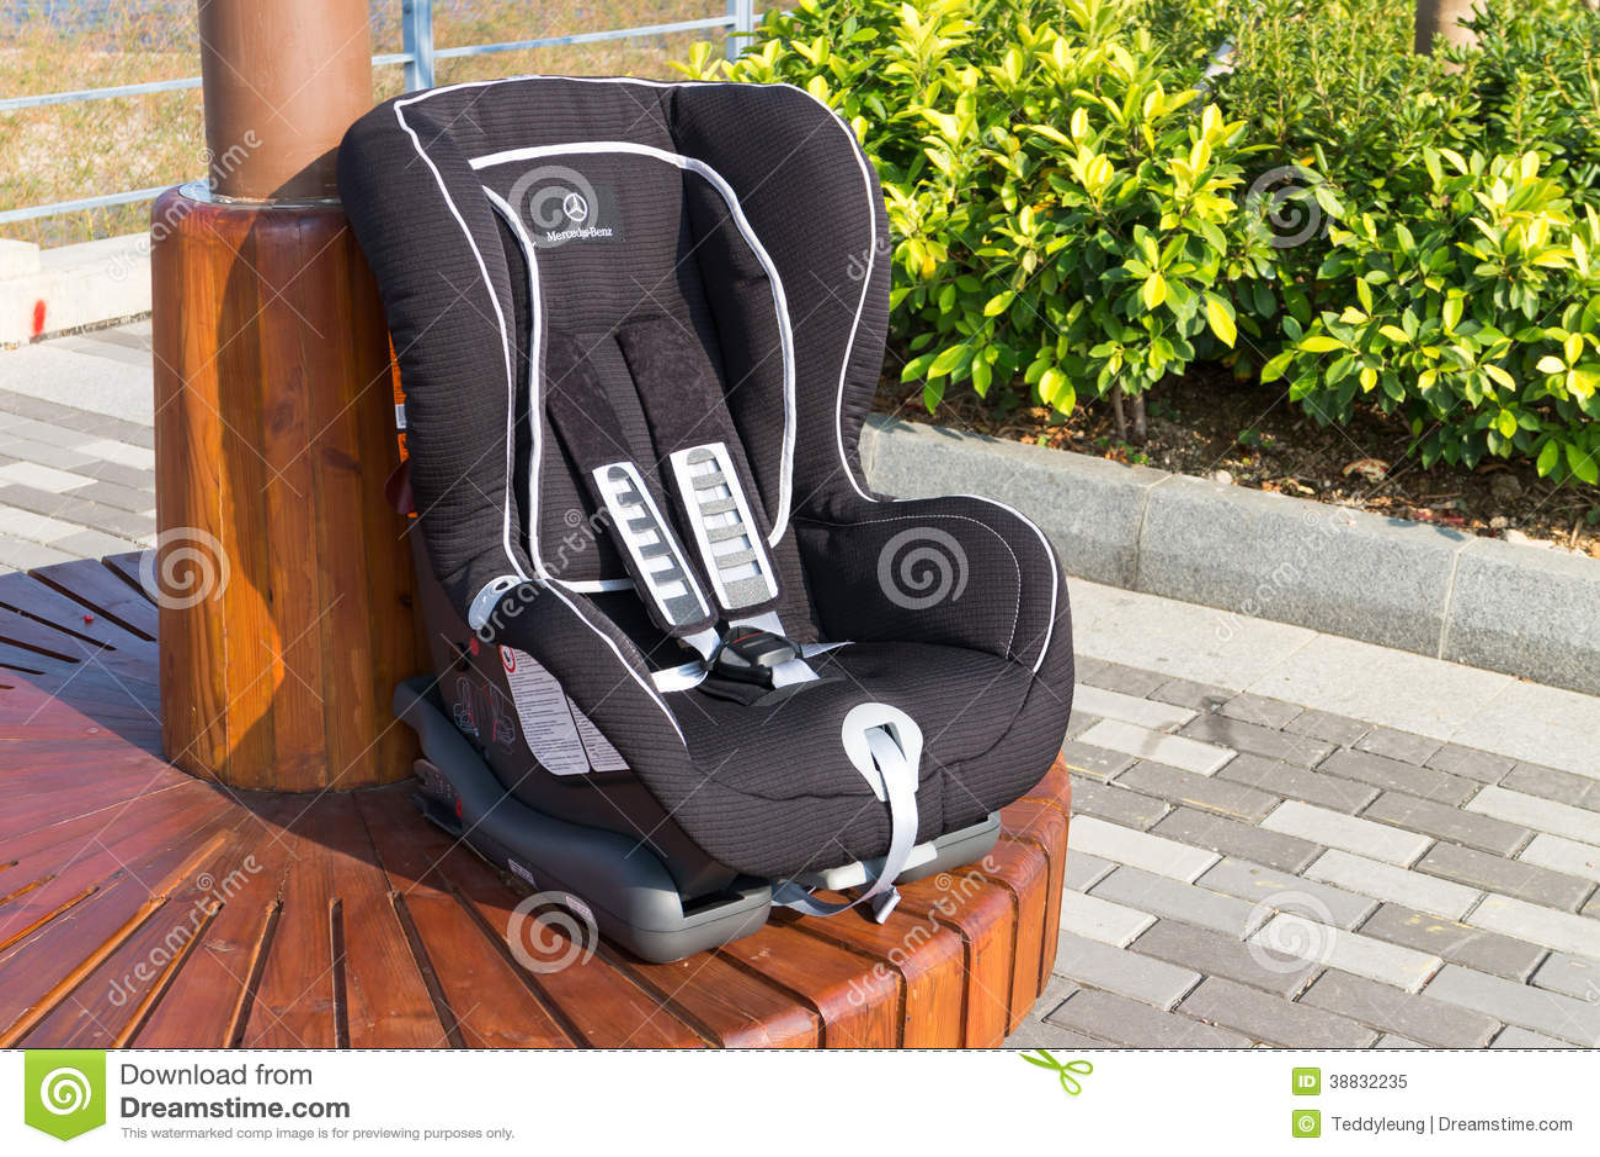 mercedes benz baby seat redaktionell foto bild av motor. Black Bedroom Furniture Sets. Home Design Ideas